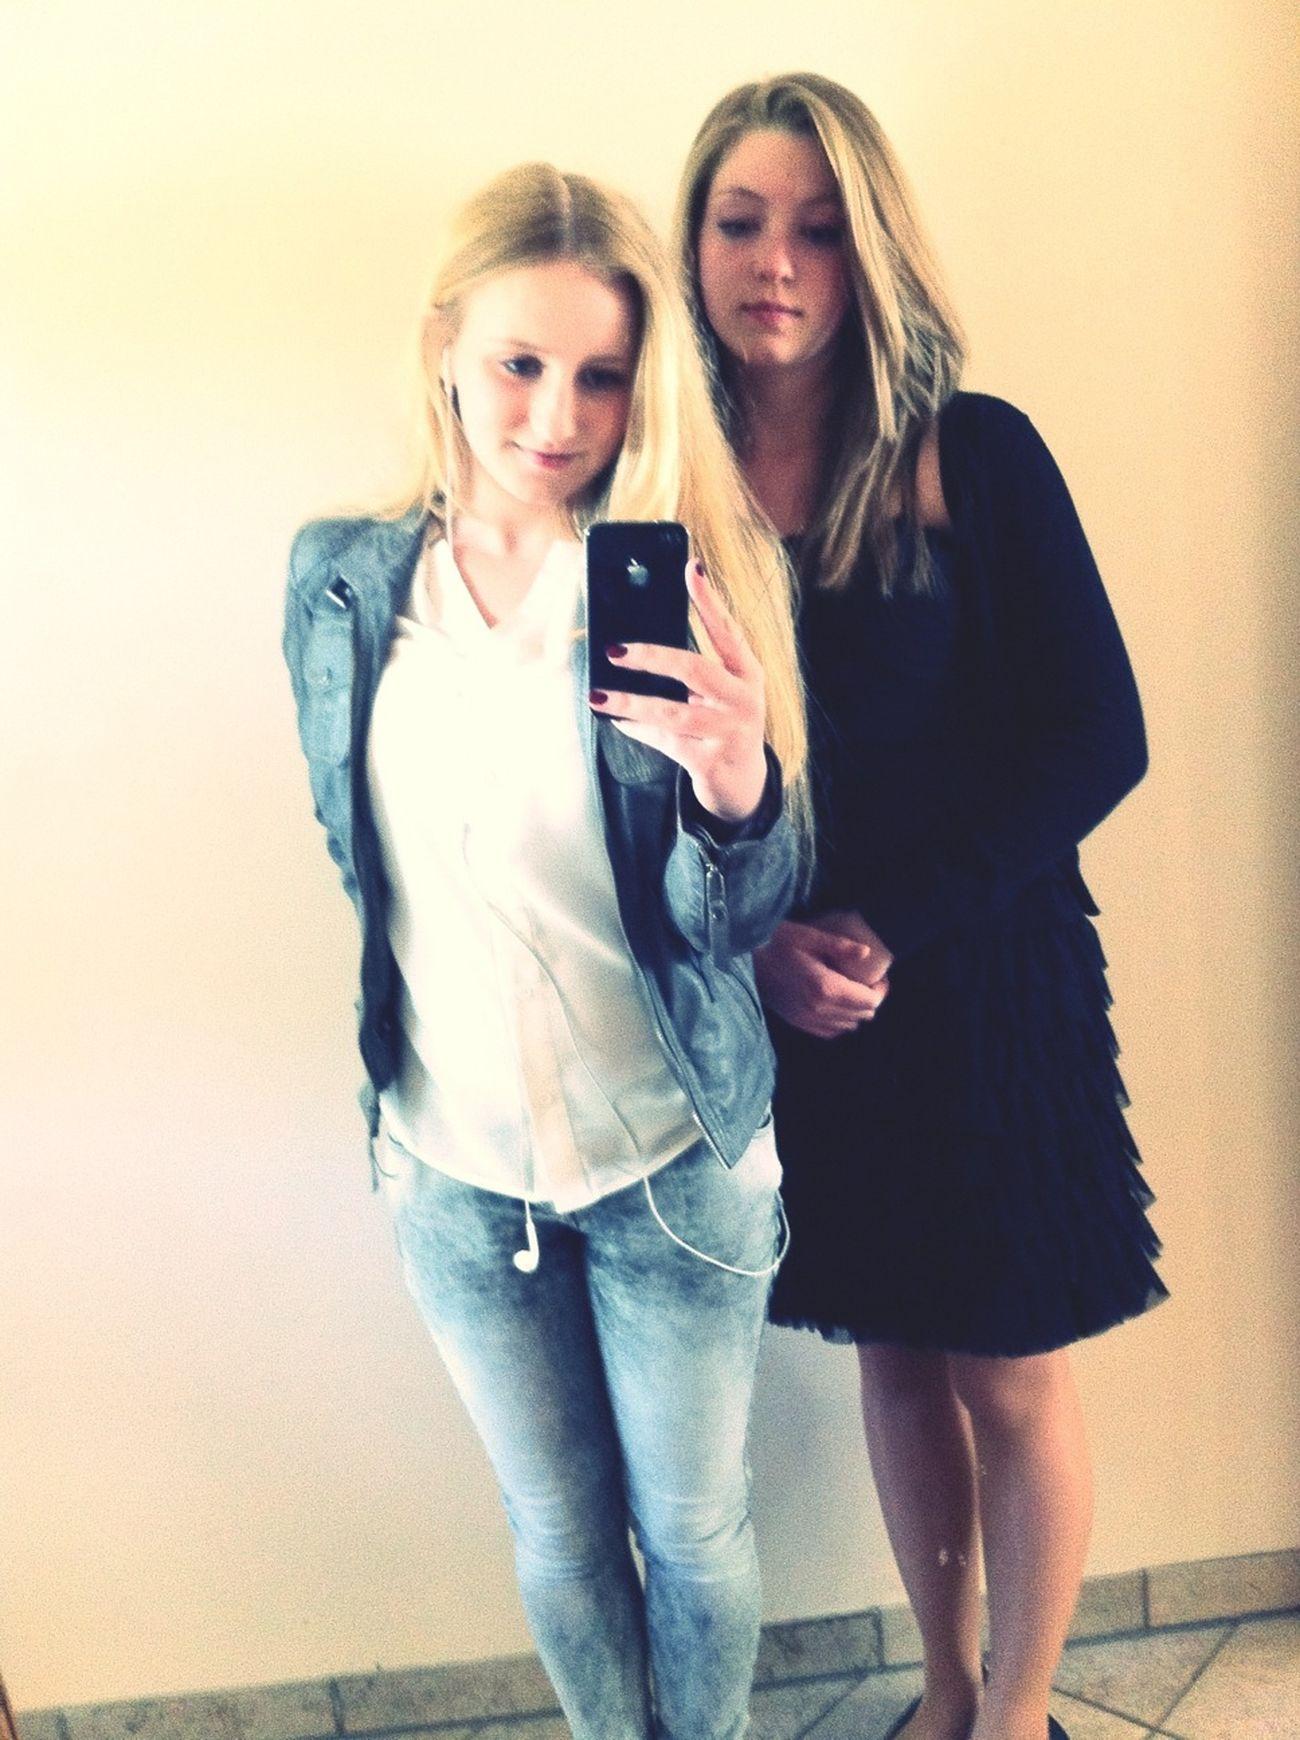 Sister , Love her ❤